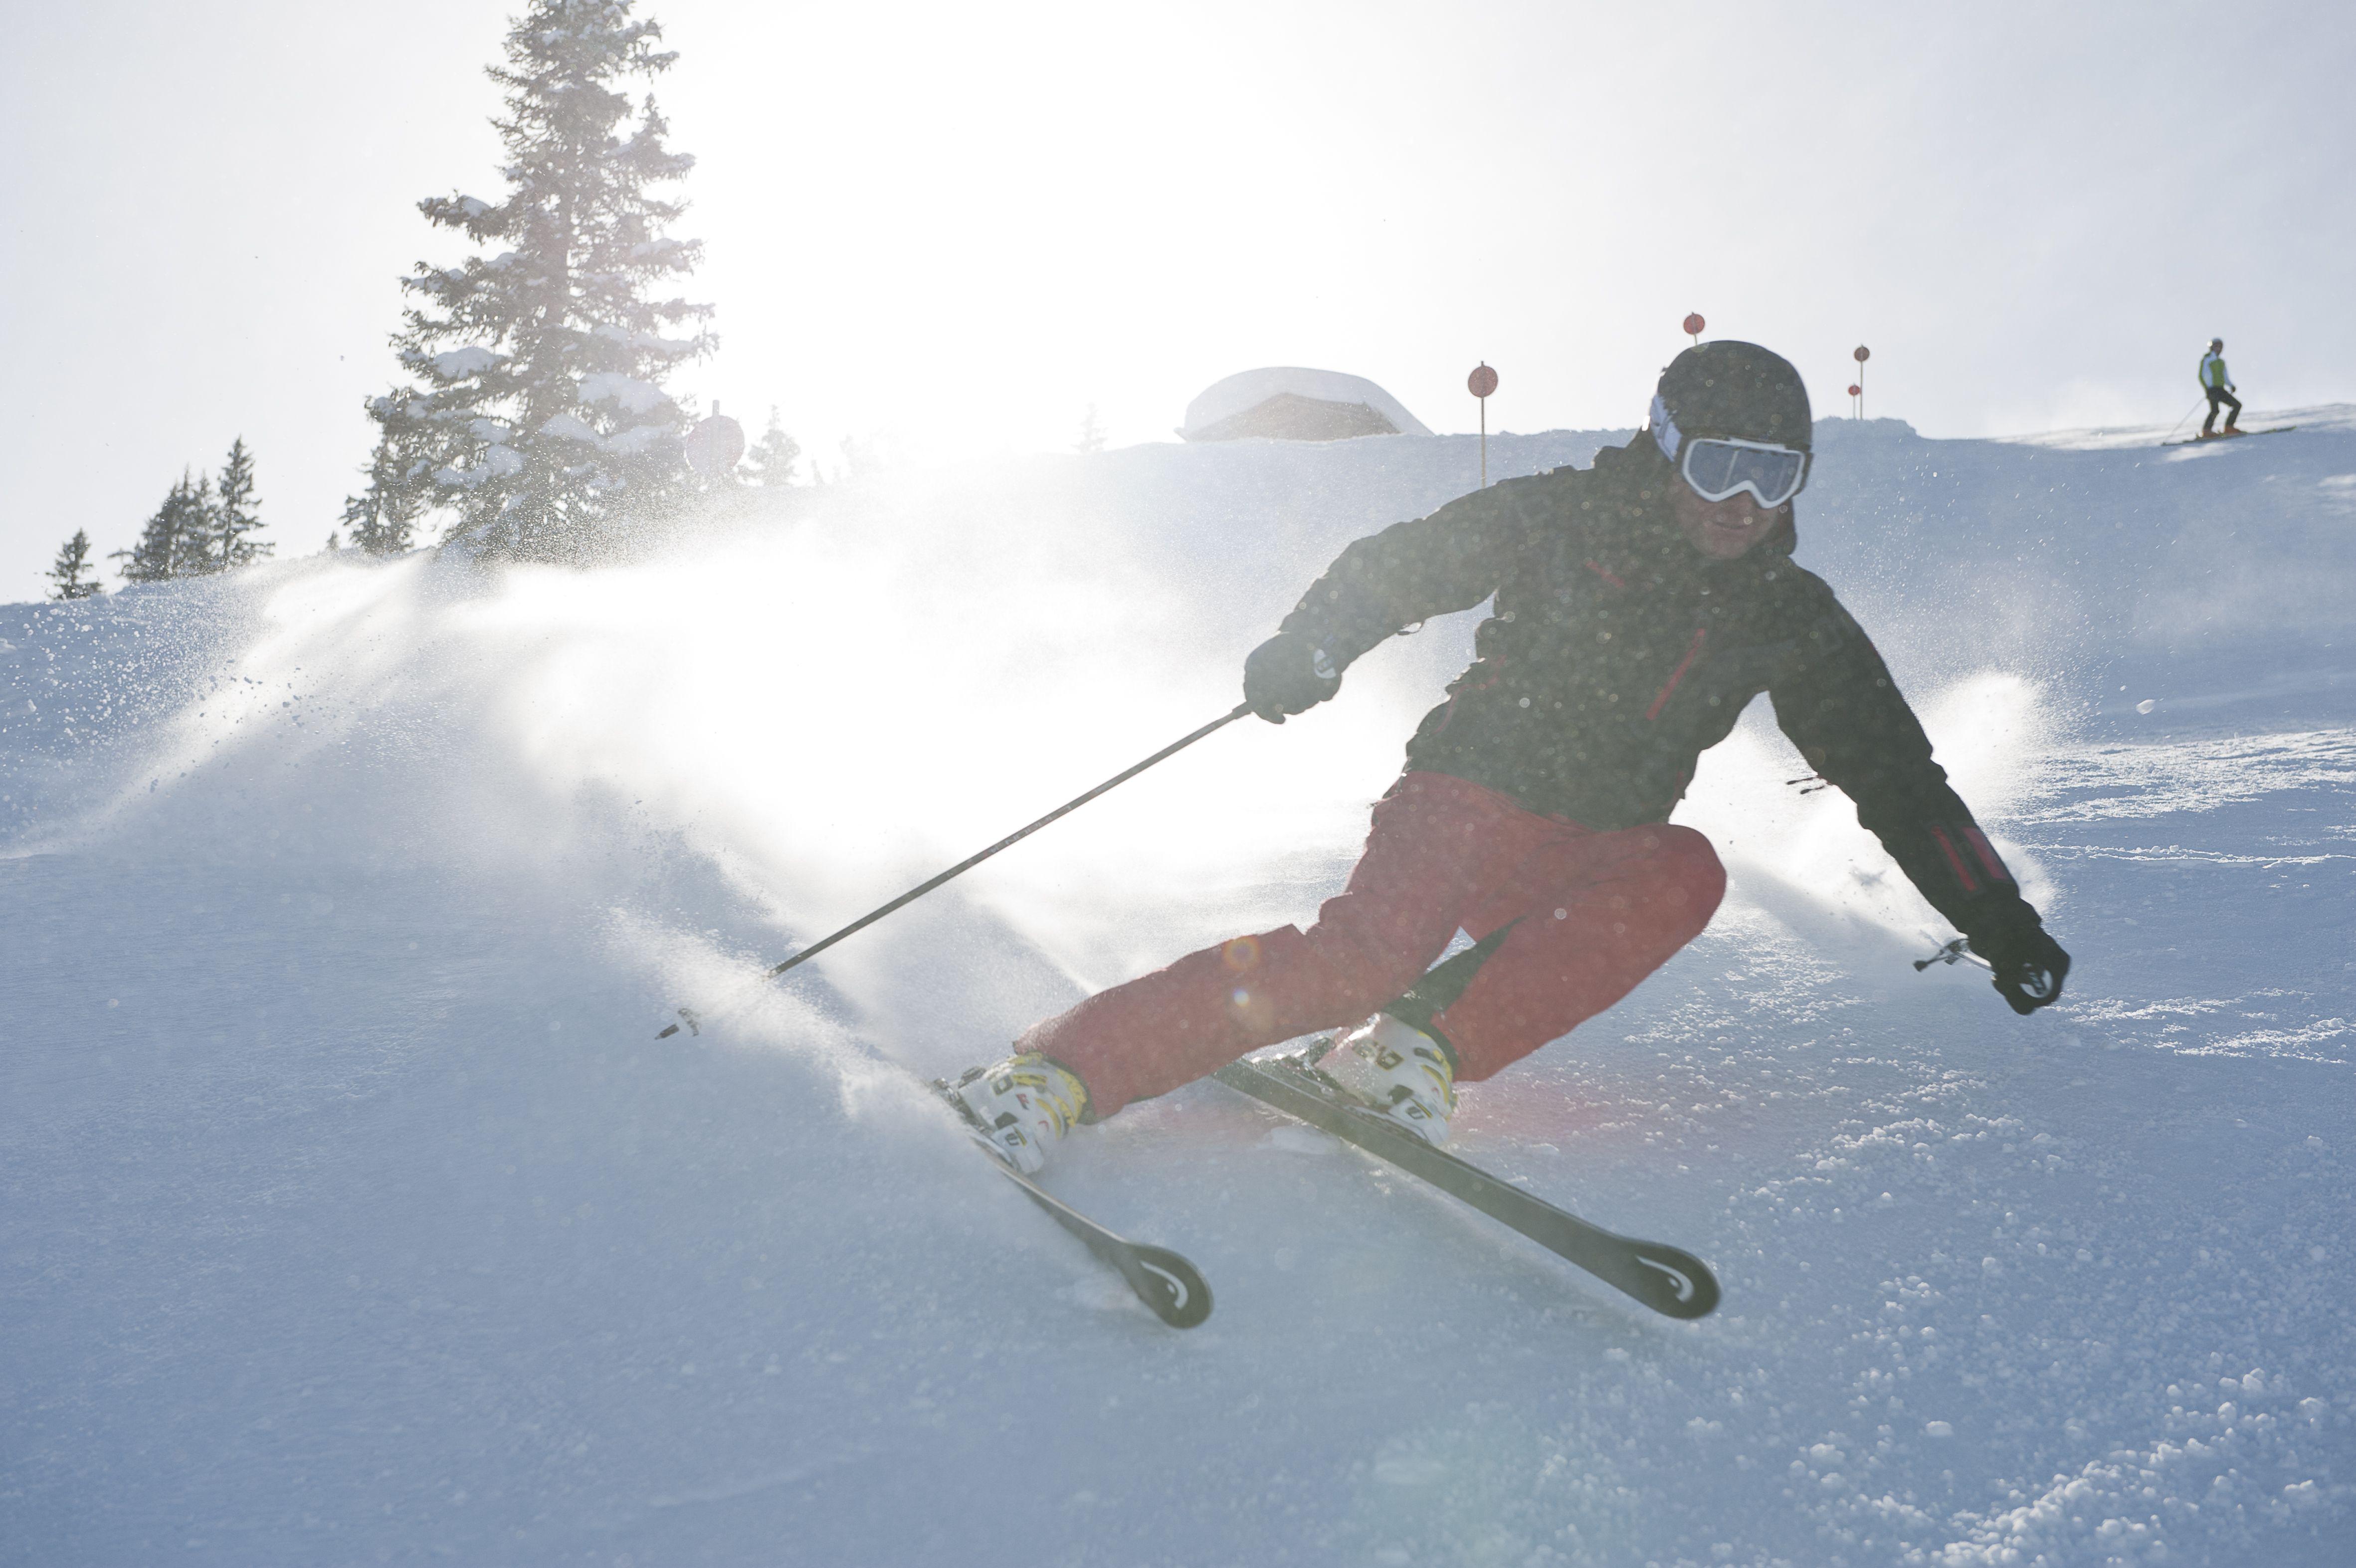 skiing at Golm in Montafon - schi fahren am Golm im Montafon